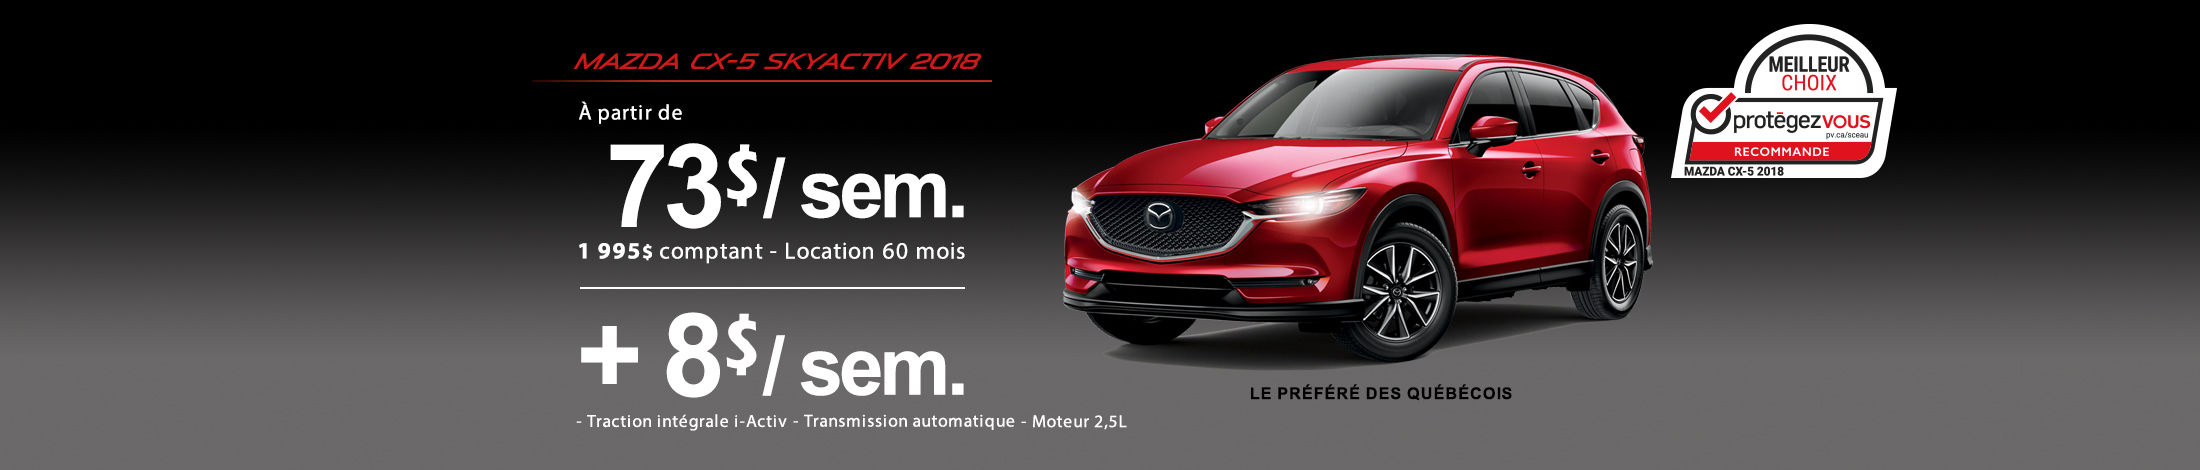 2018 Mazda CX-5 Banner